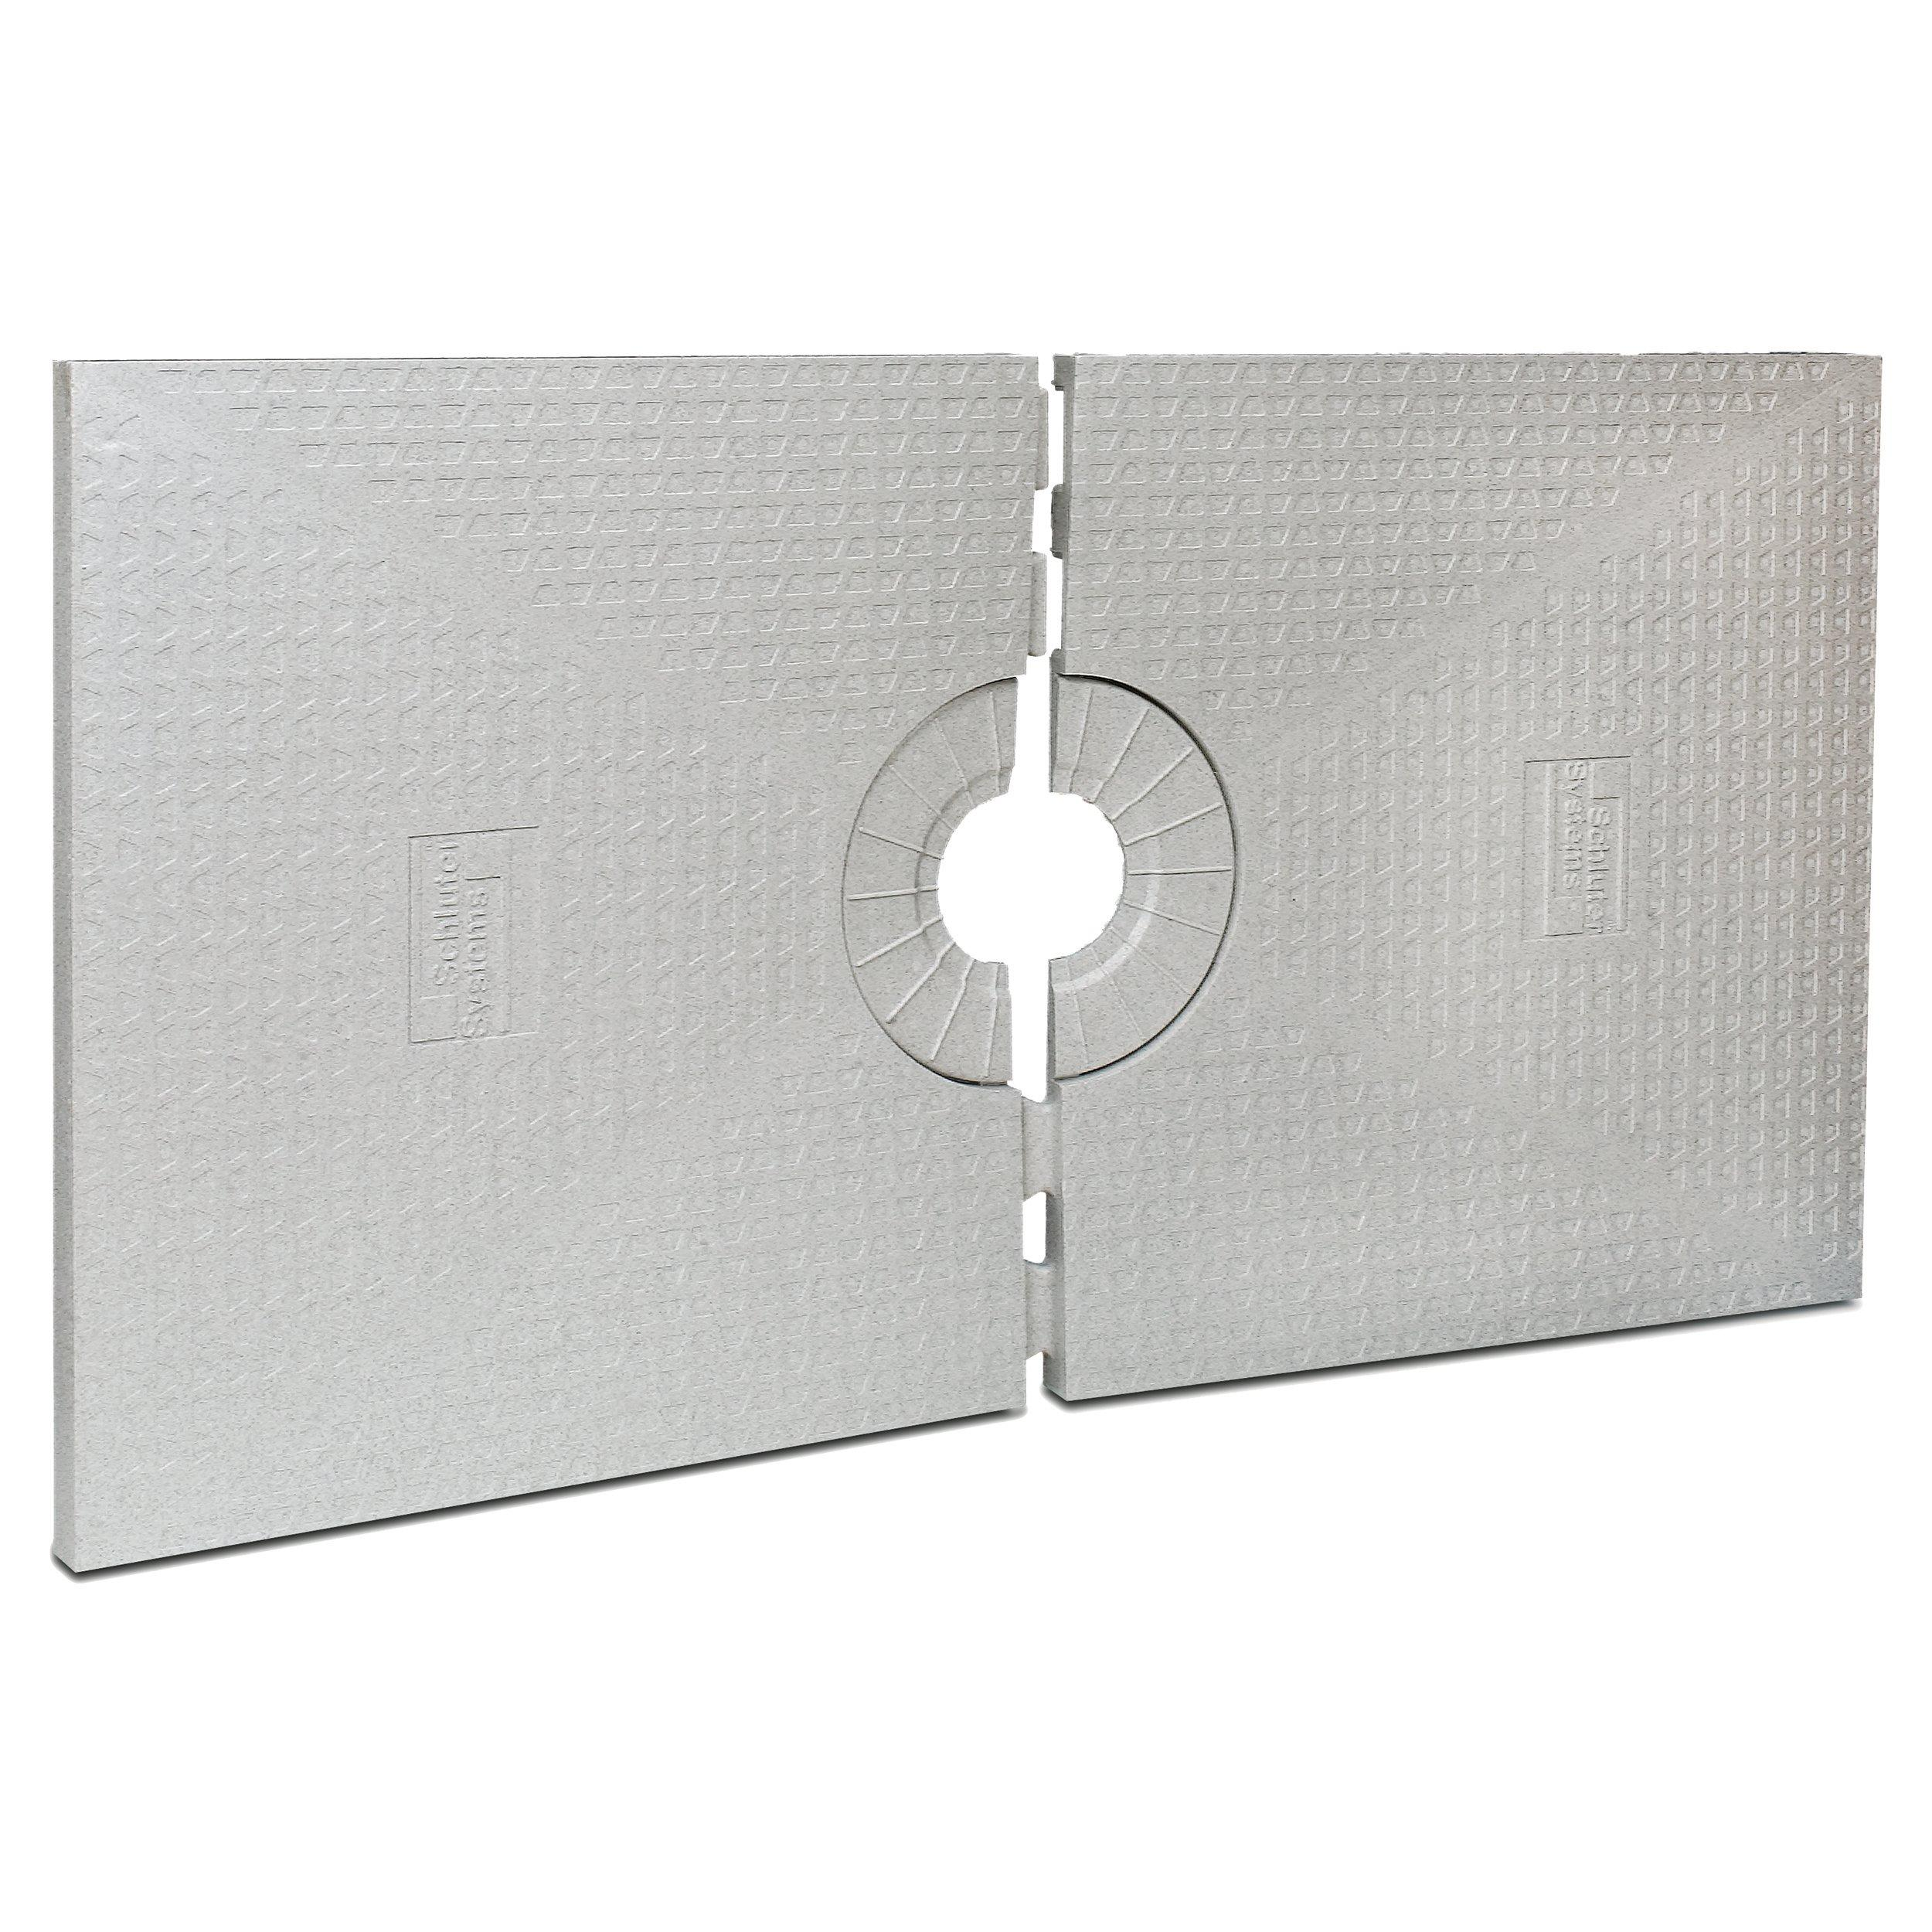 Schluter Kerdi Shower ST Shower Tray For Use With Kerdi Drain